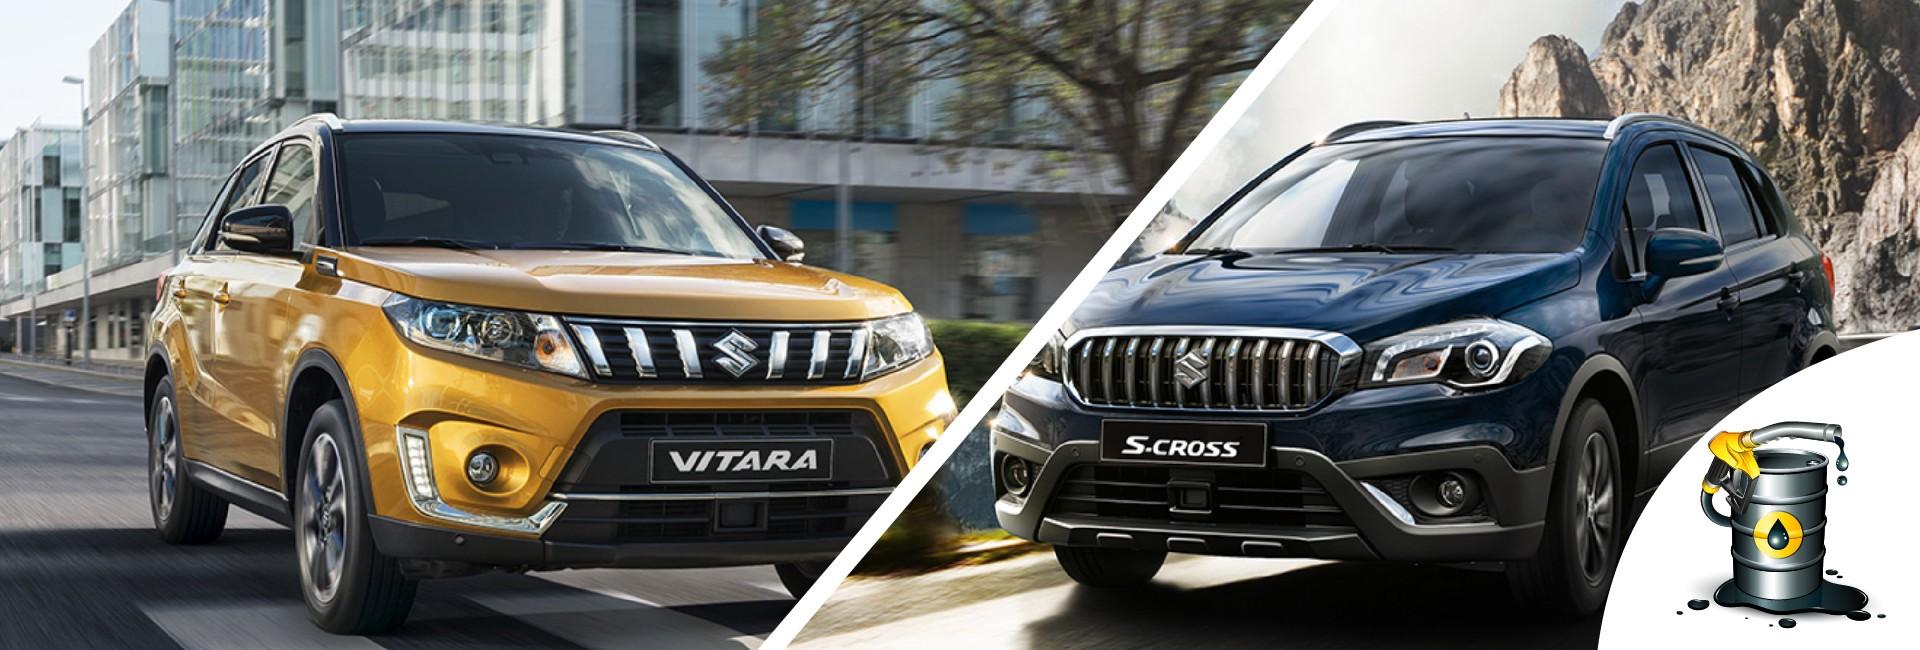 Suzuki VITARA a S-CROSS